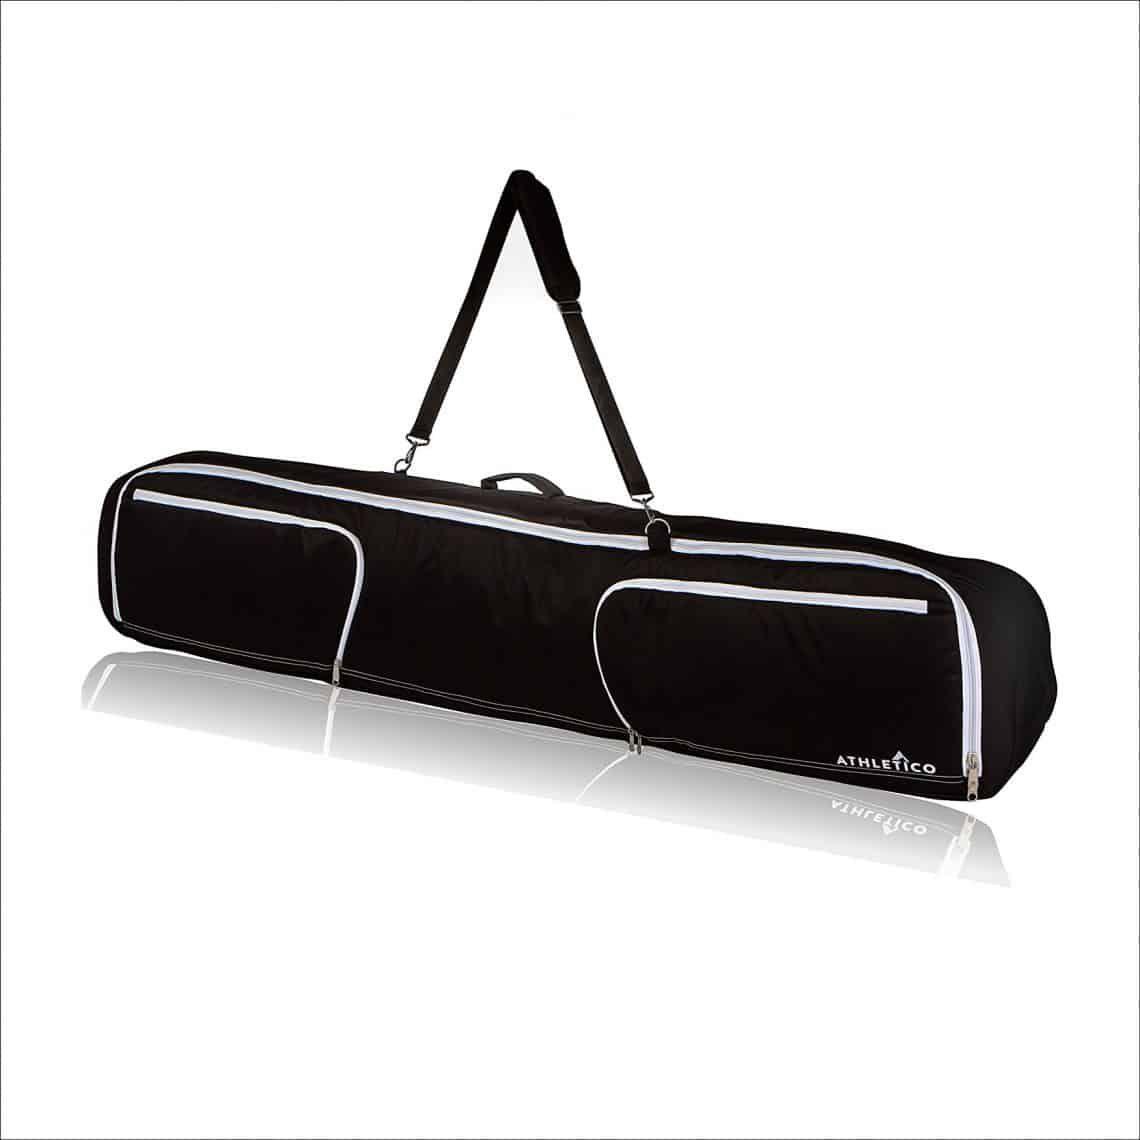 Athletico Maverick Padded Snowboard Bag Snowboard Bag Snowboard Bags